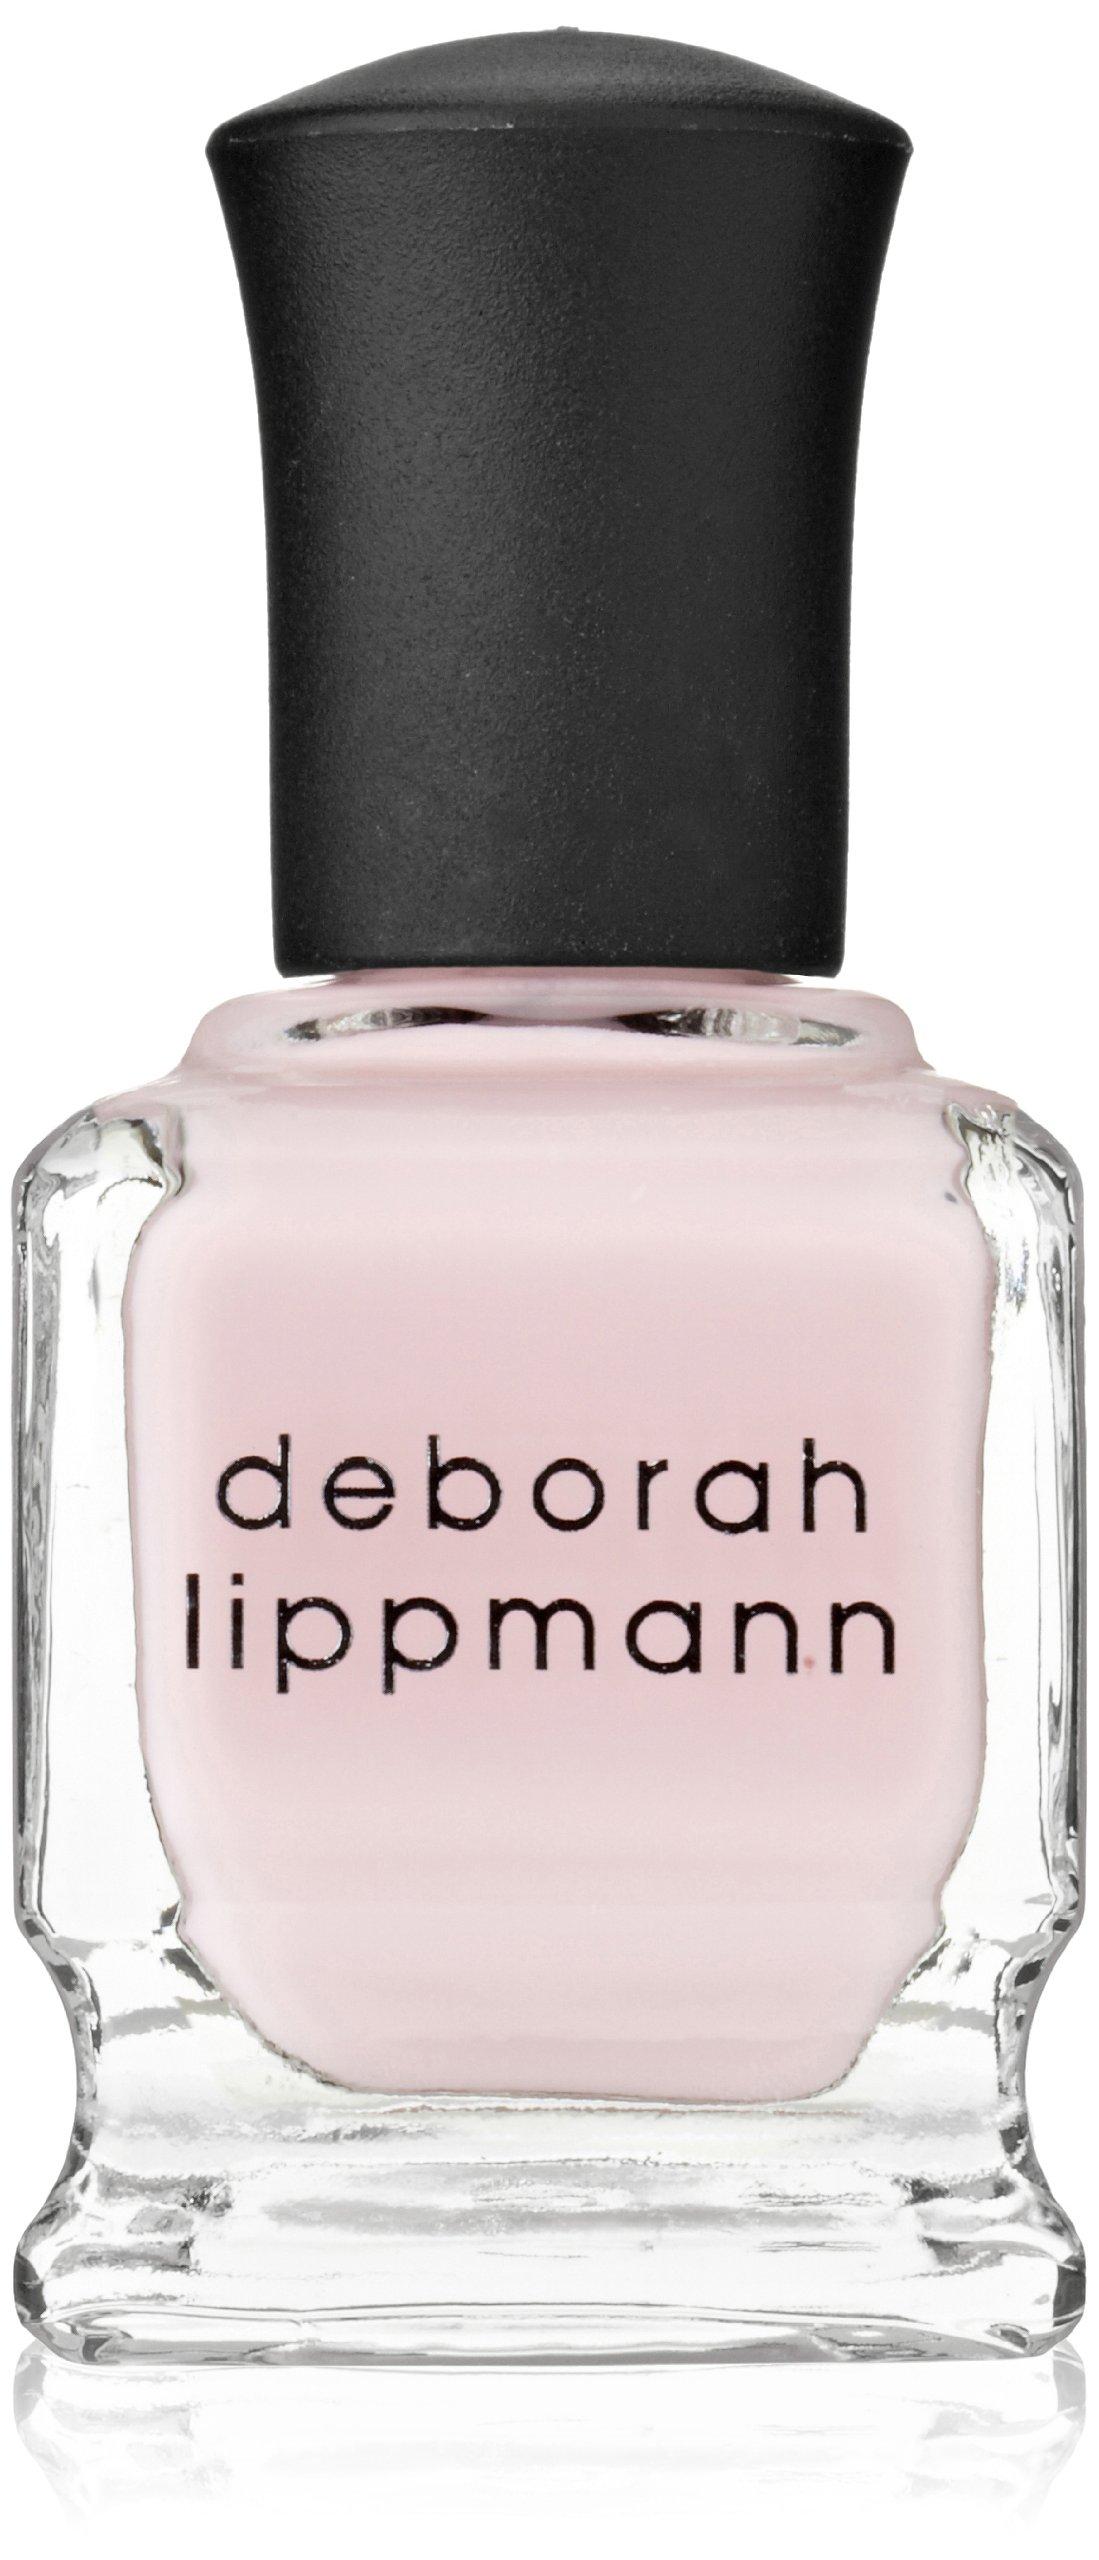 Amazon.com : deborah lippmann Shimmer Nail Lacquer, Whatever Lola ...